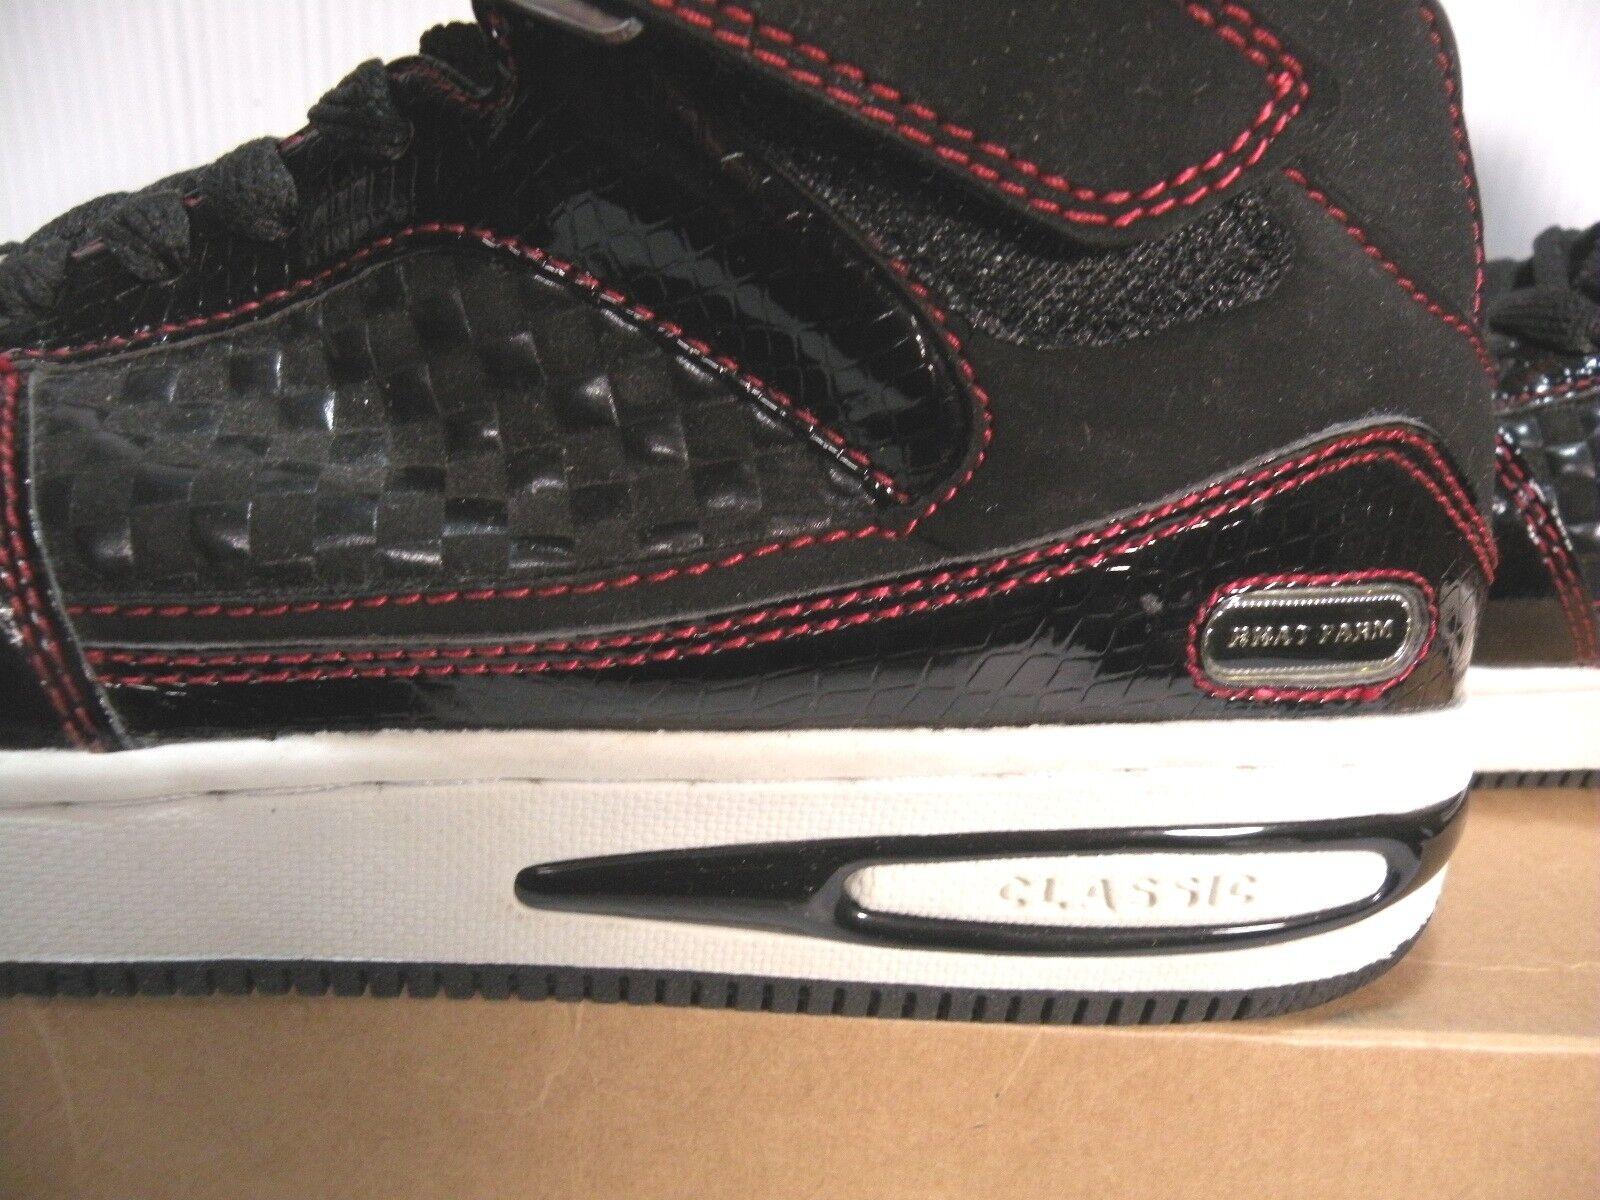 PHAT FARM 6-000802A CLASSIC HI MEN Schuhe BLACK/ROT/Weiß 6-000802A FARM SIZE 8 NEW a041de